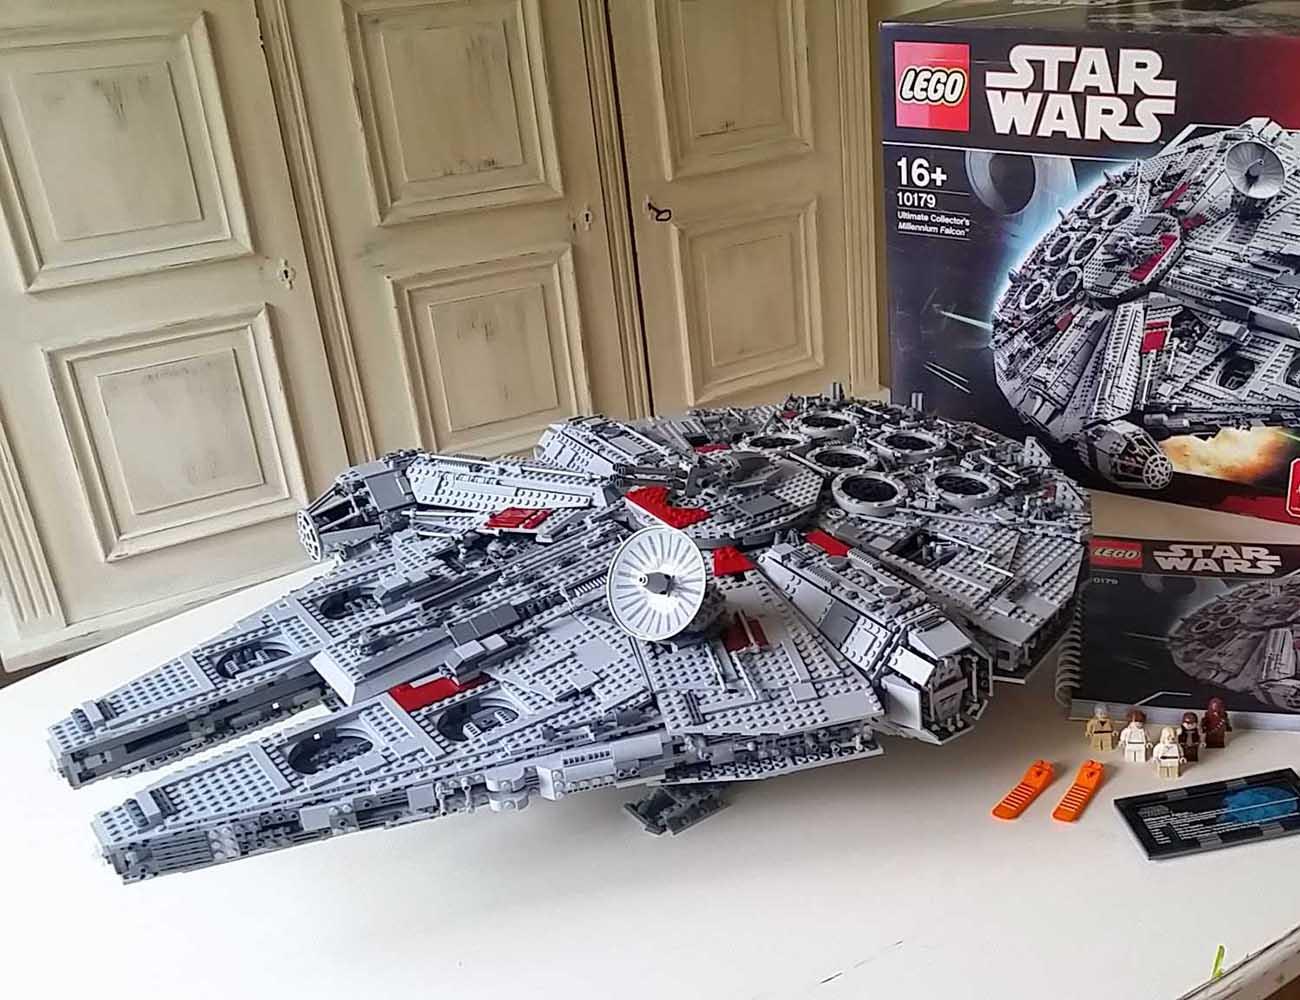 LEGO Star Wars Millennium Falcon » Gadget Flow